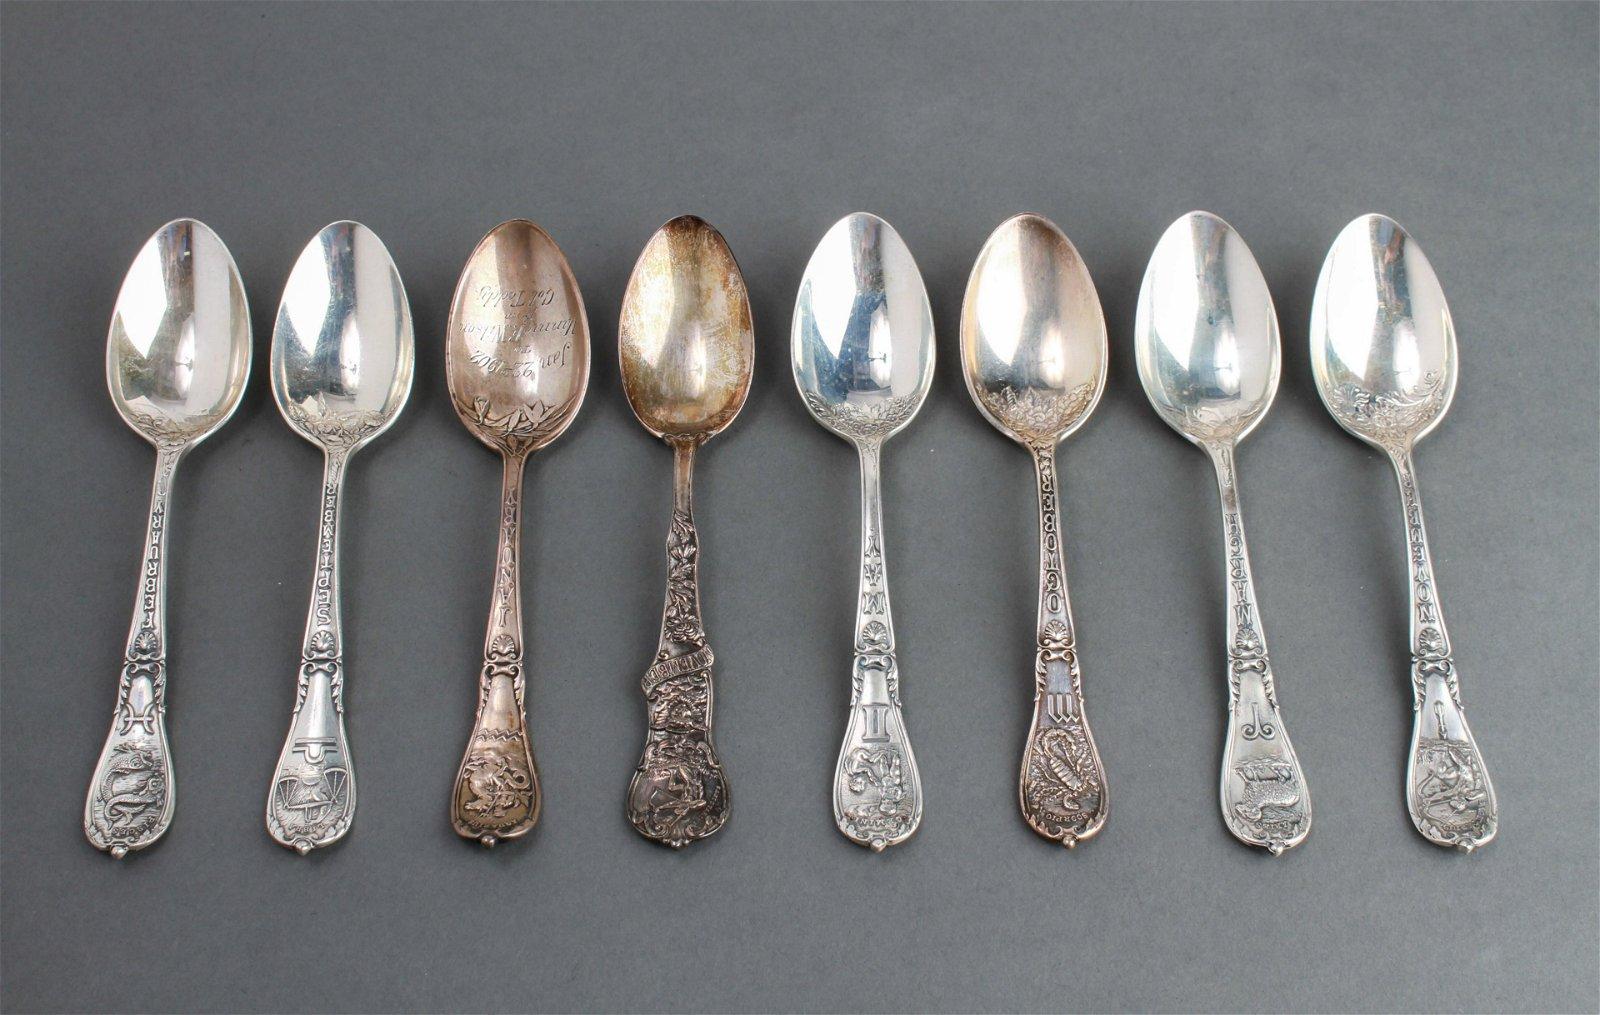 Gorham & Mechanics Co. Silver Zodiac Tea Spoons 8